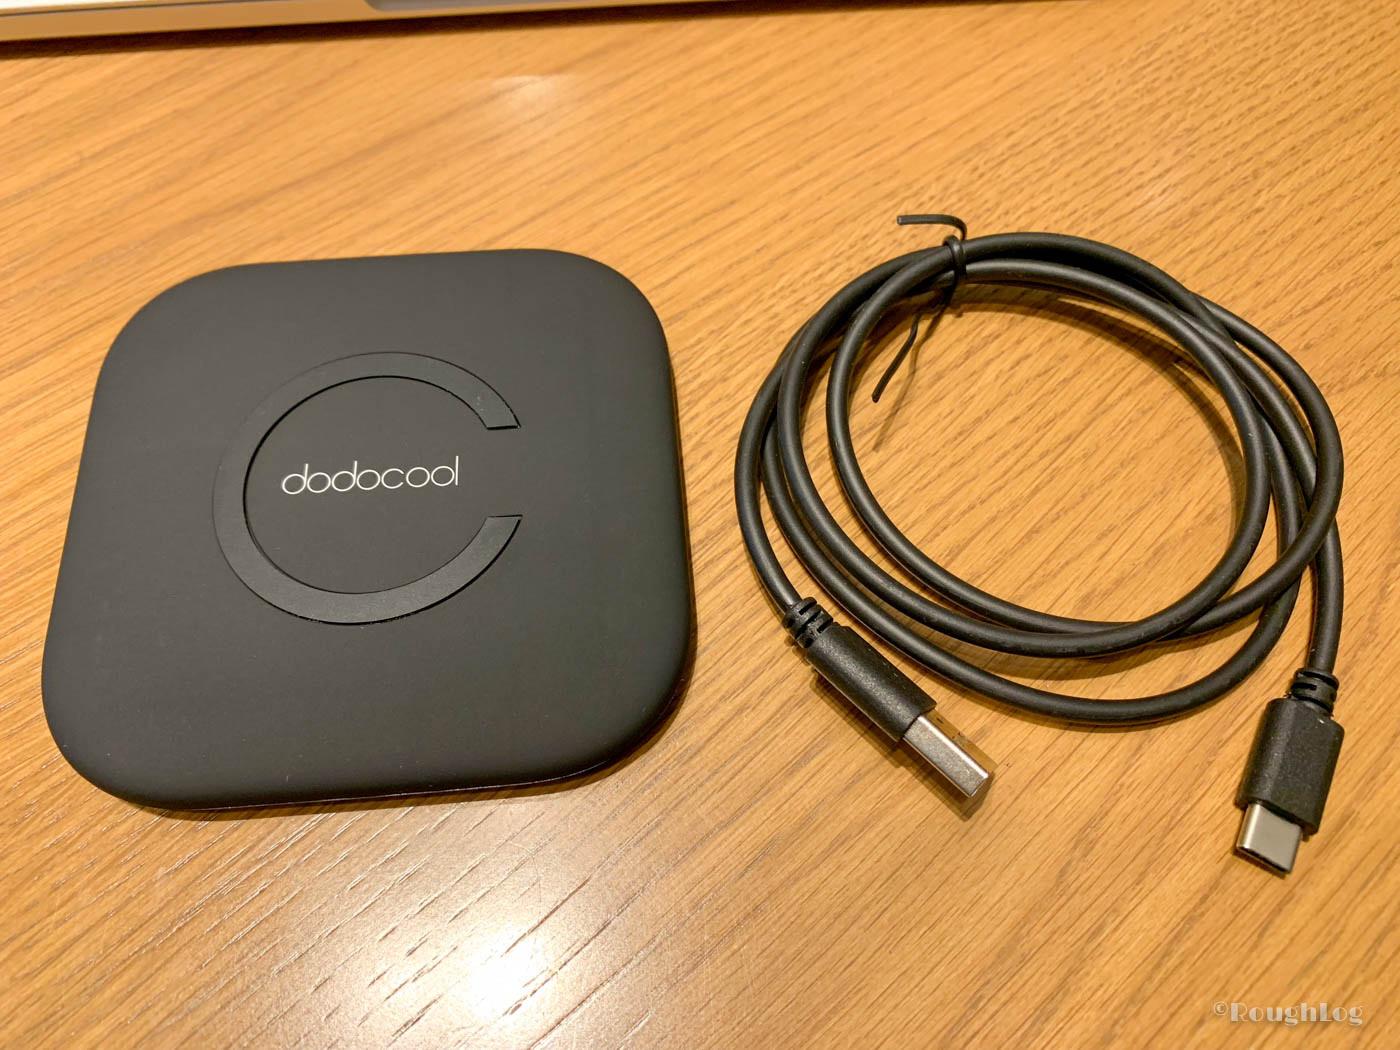 dodocool製Qiワイヤレス充電器の中身は本体とUSBケーブル